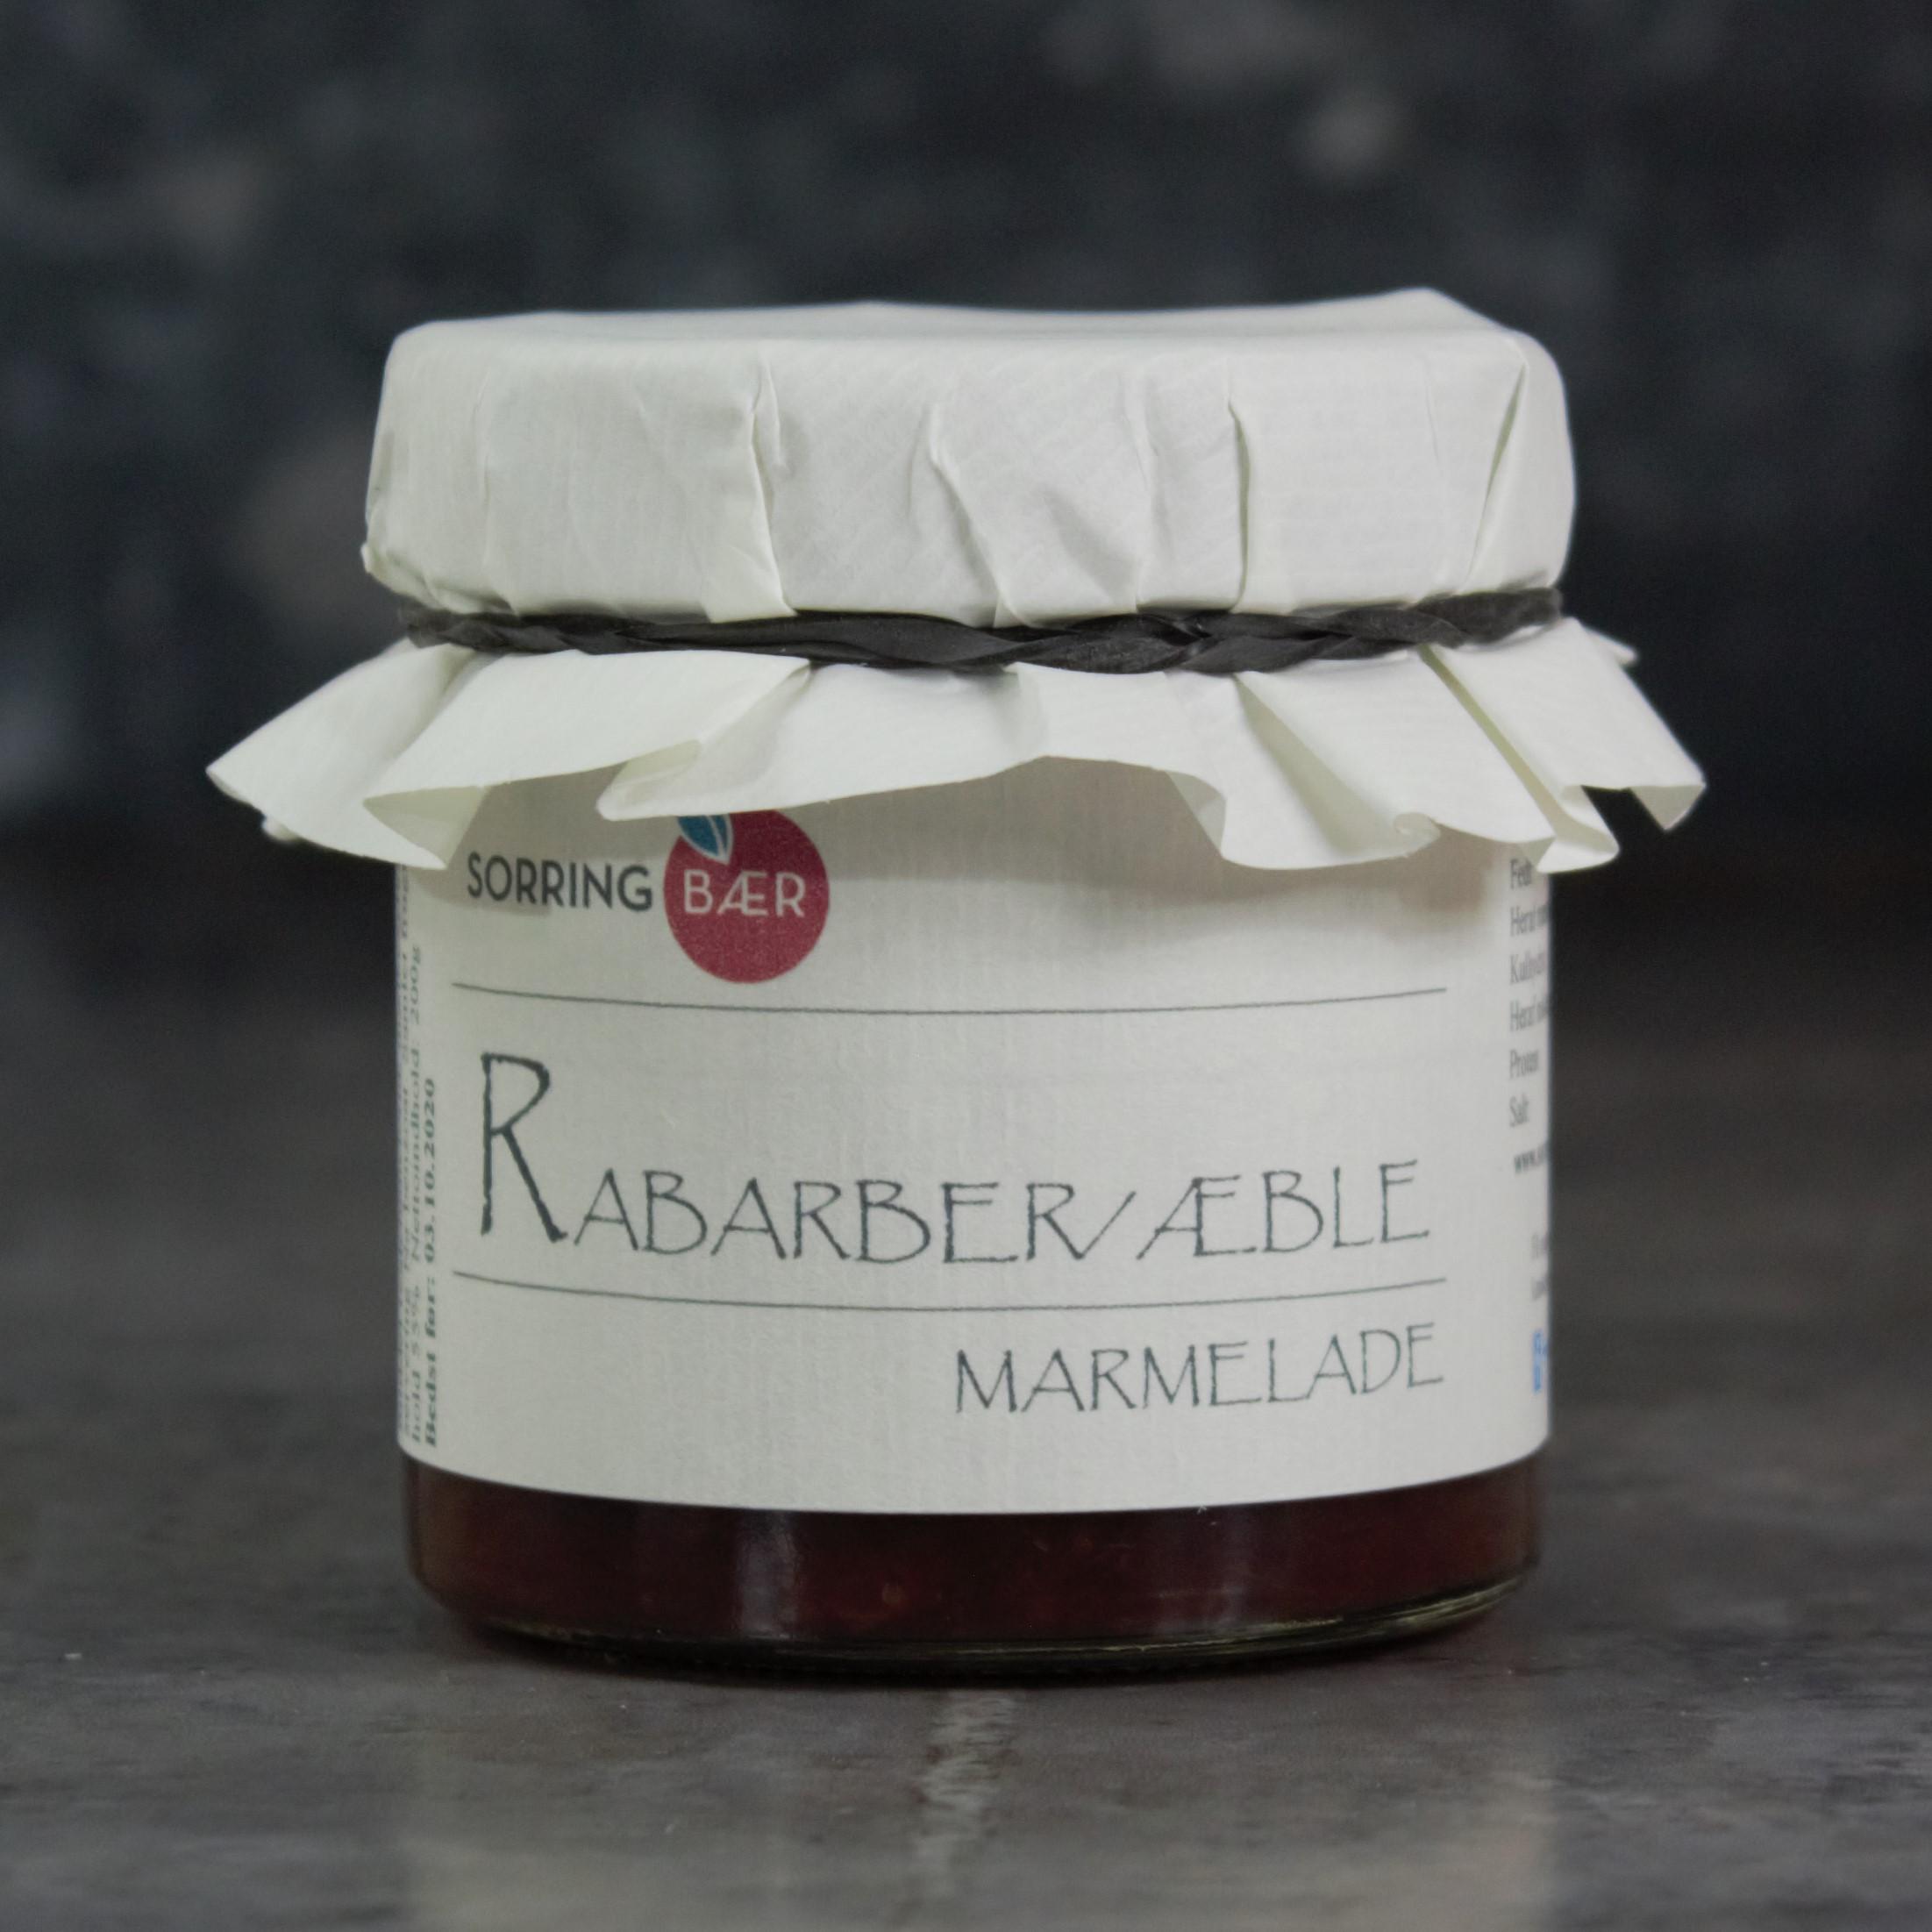 Rabarber/æblemarmelade, 200g